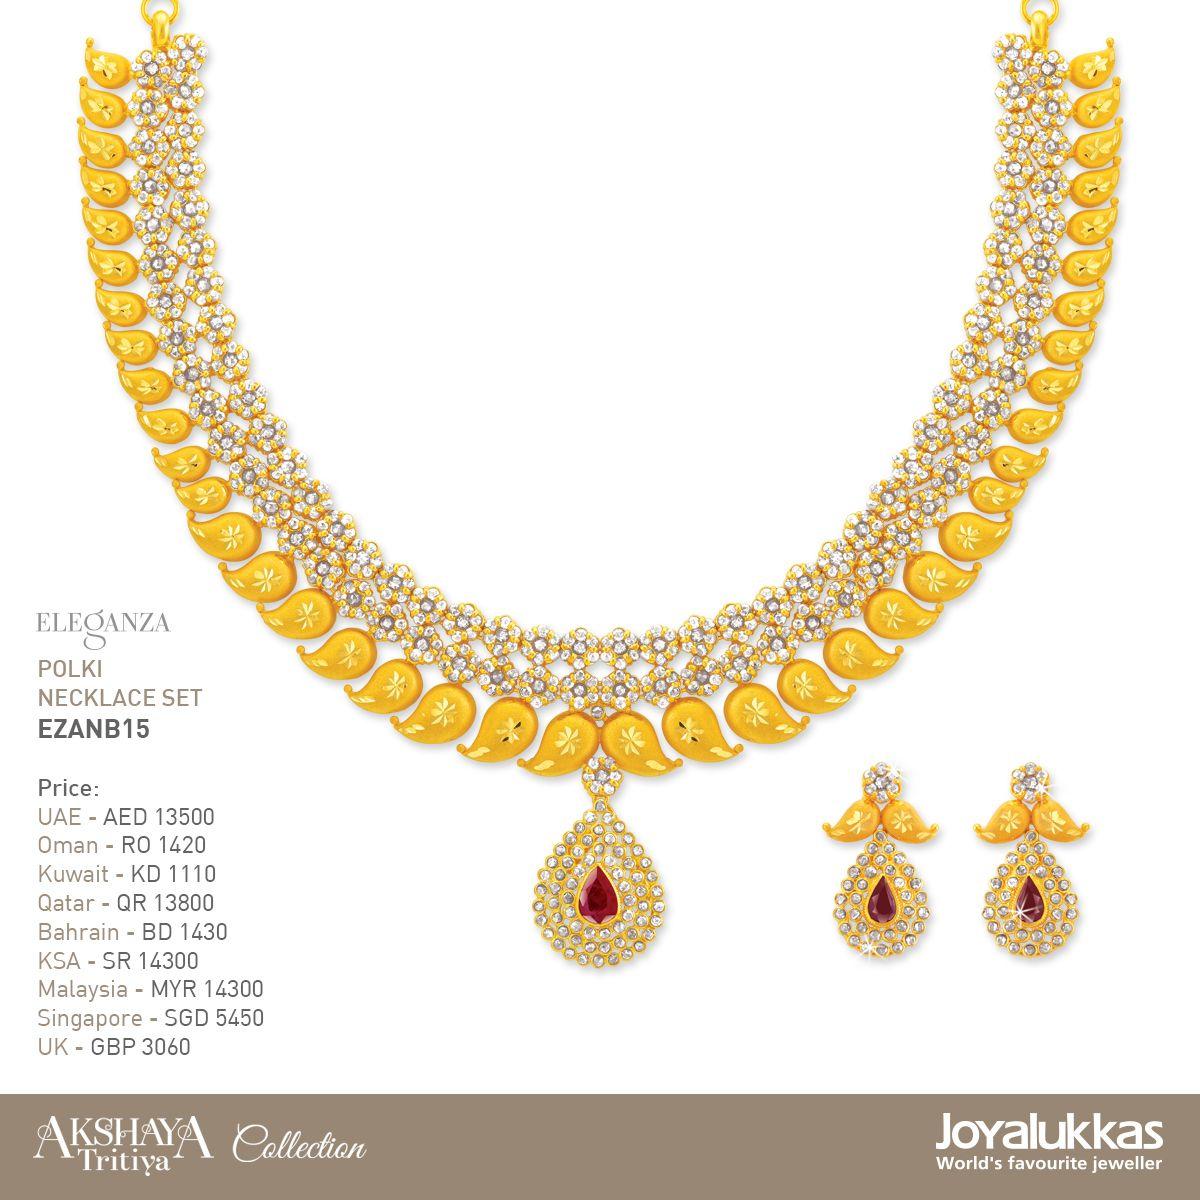 Akshaya Tritiya Special Collection Jewelry Collection Jewelry